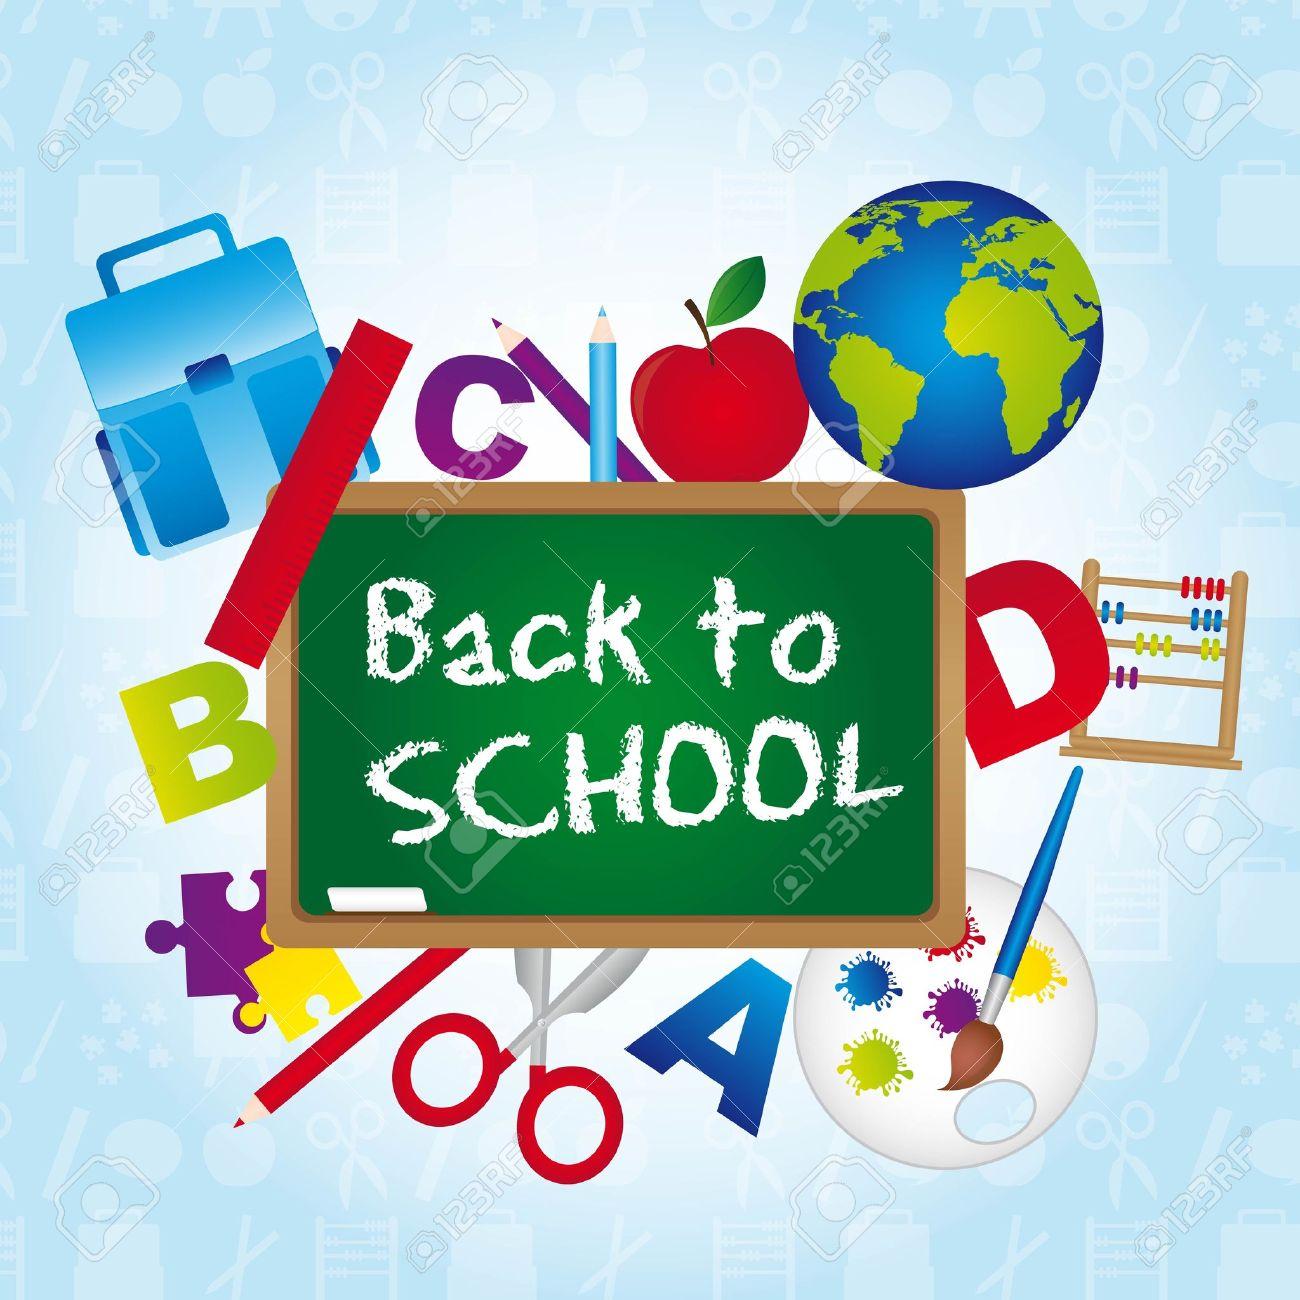 back to school over blue background. vector illustration - 11986434